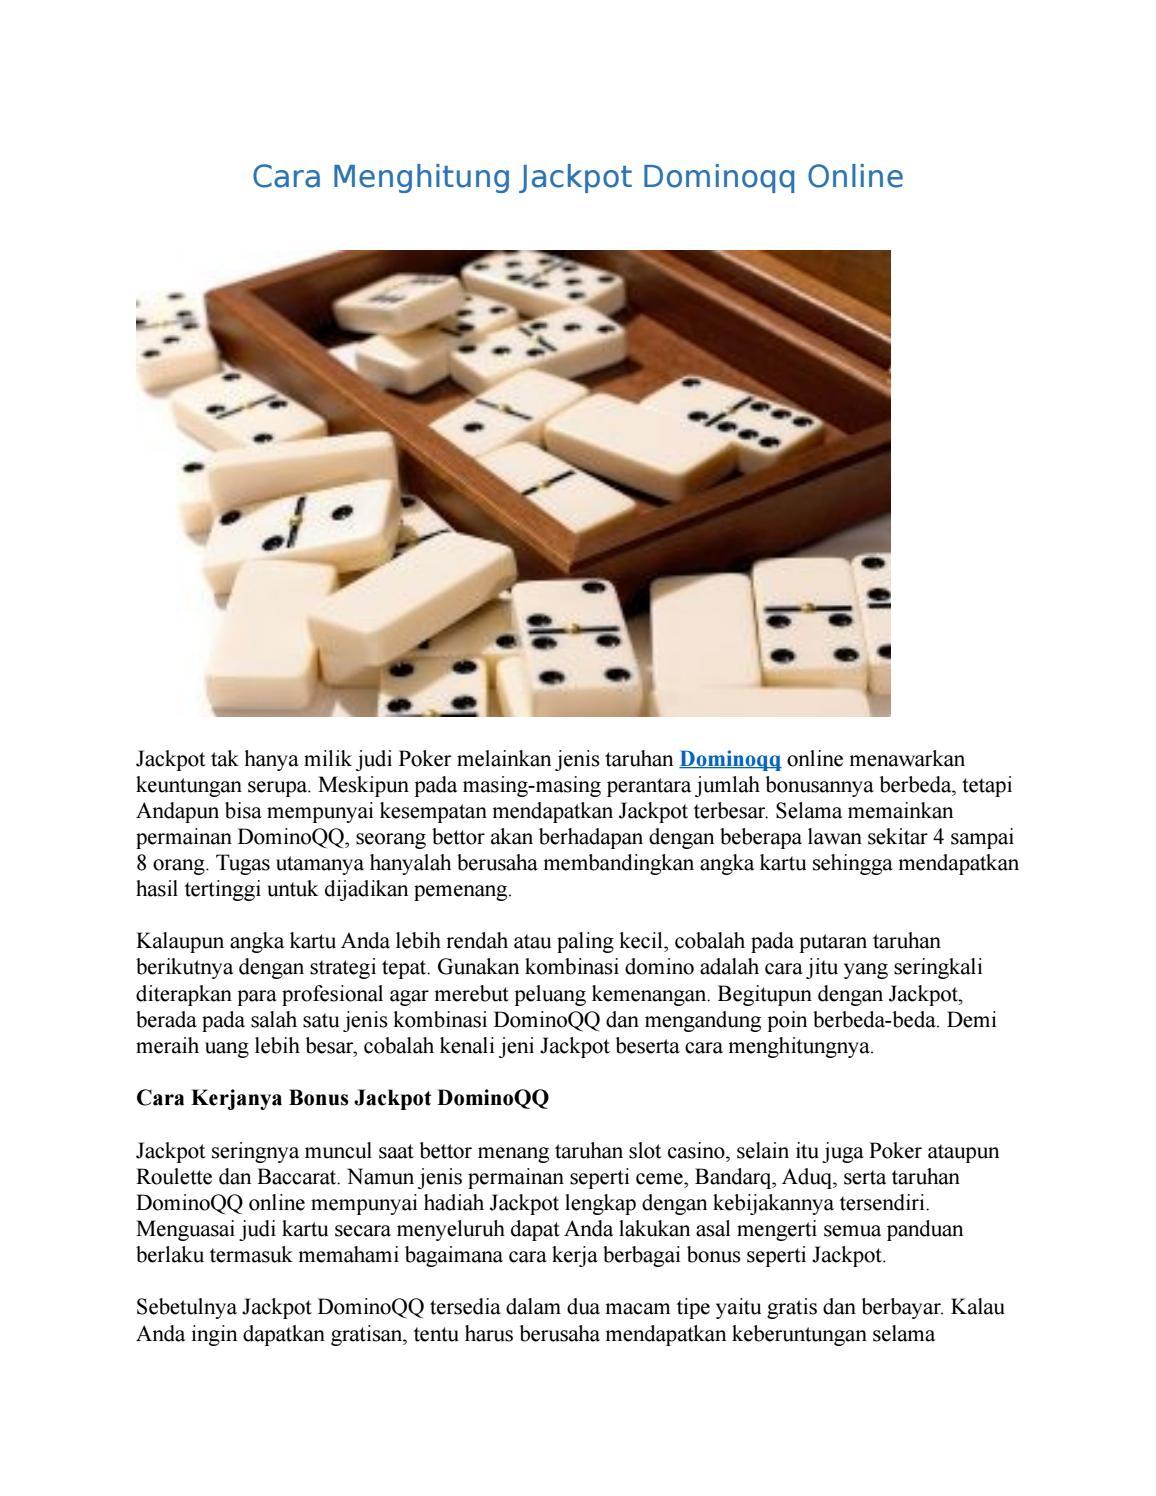 Cara Menghitung Jackpot Dominoqq Online By Vivitan Issuu